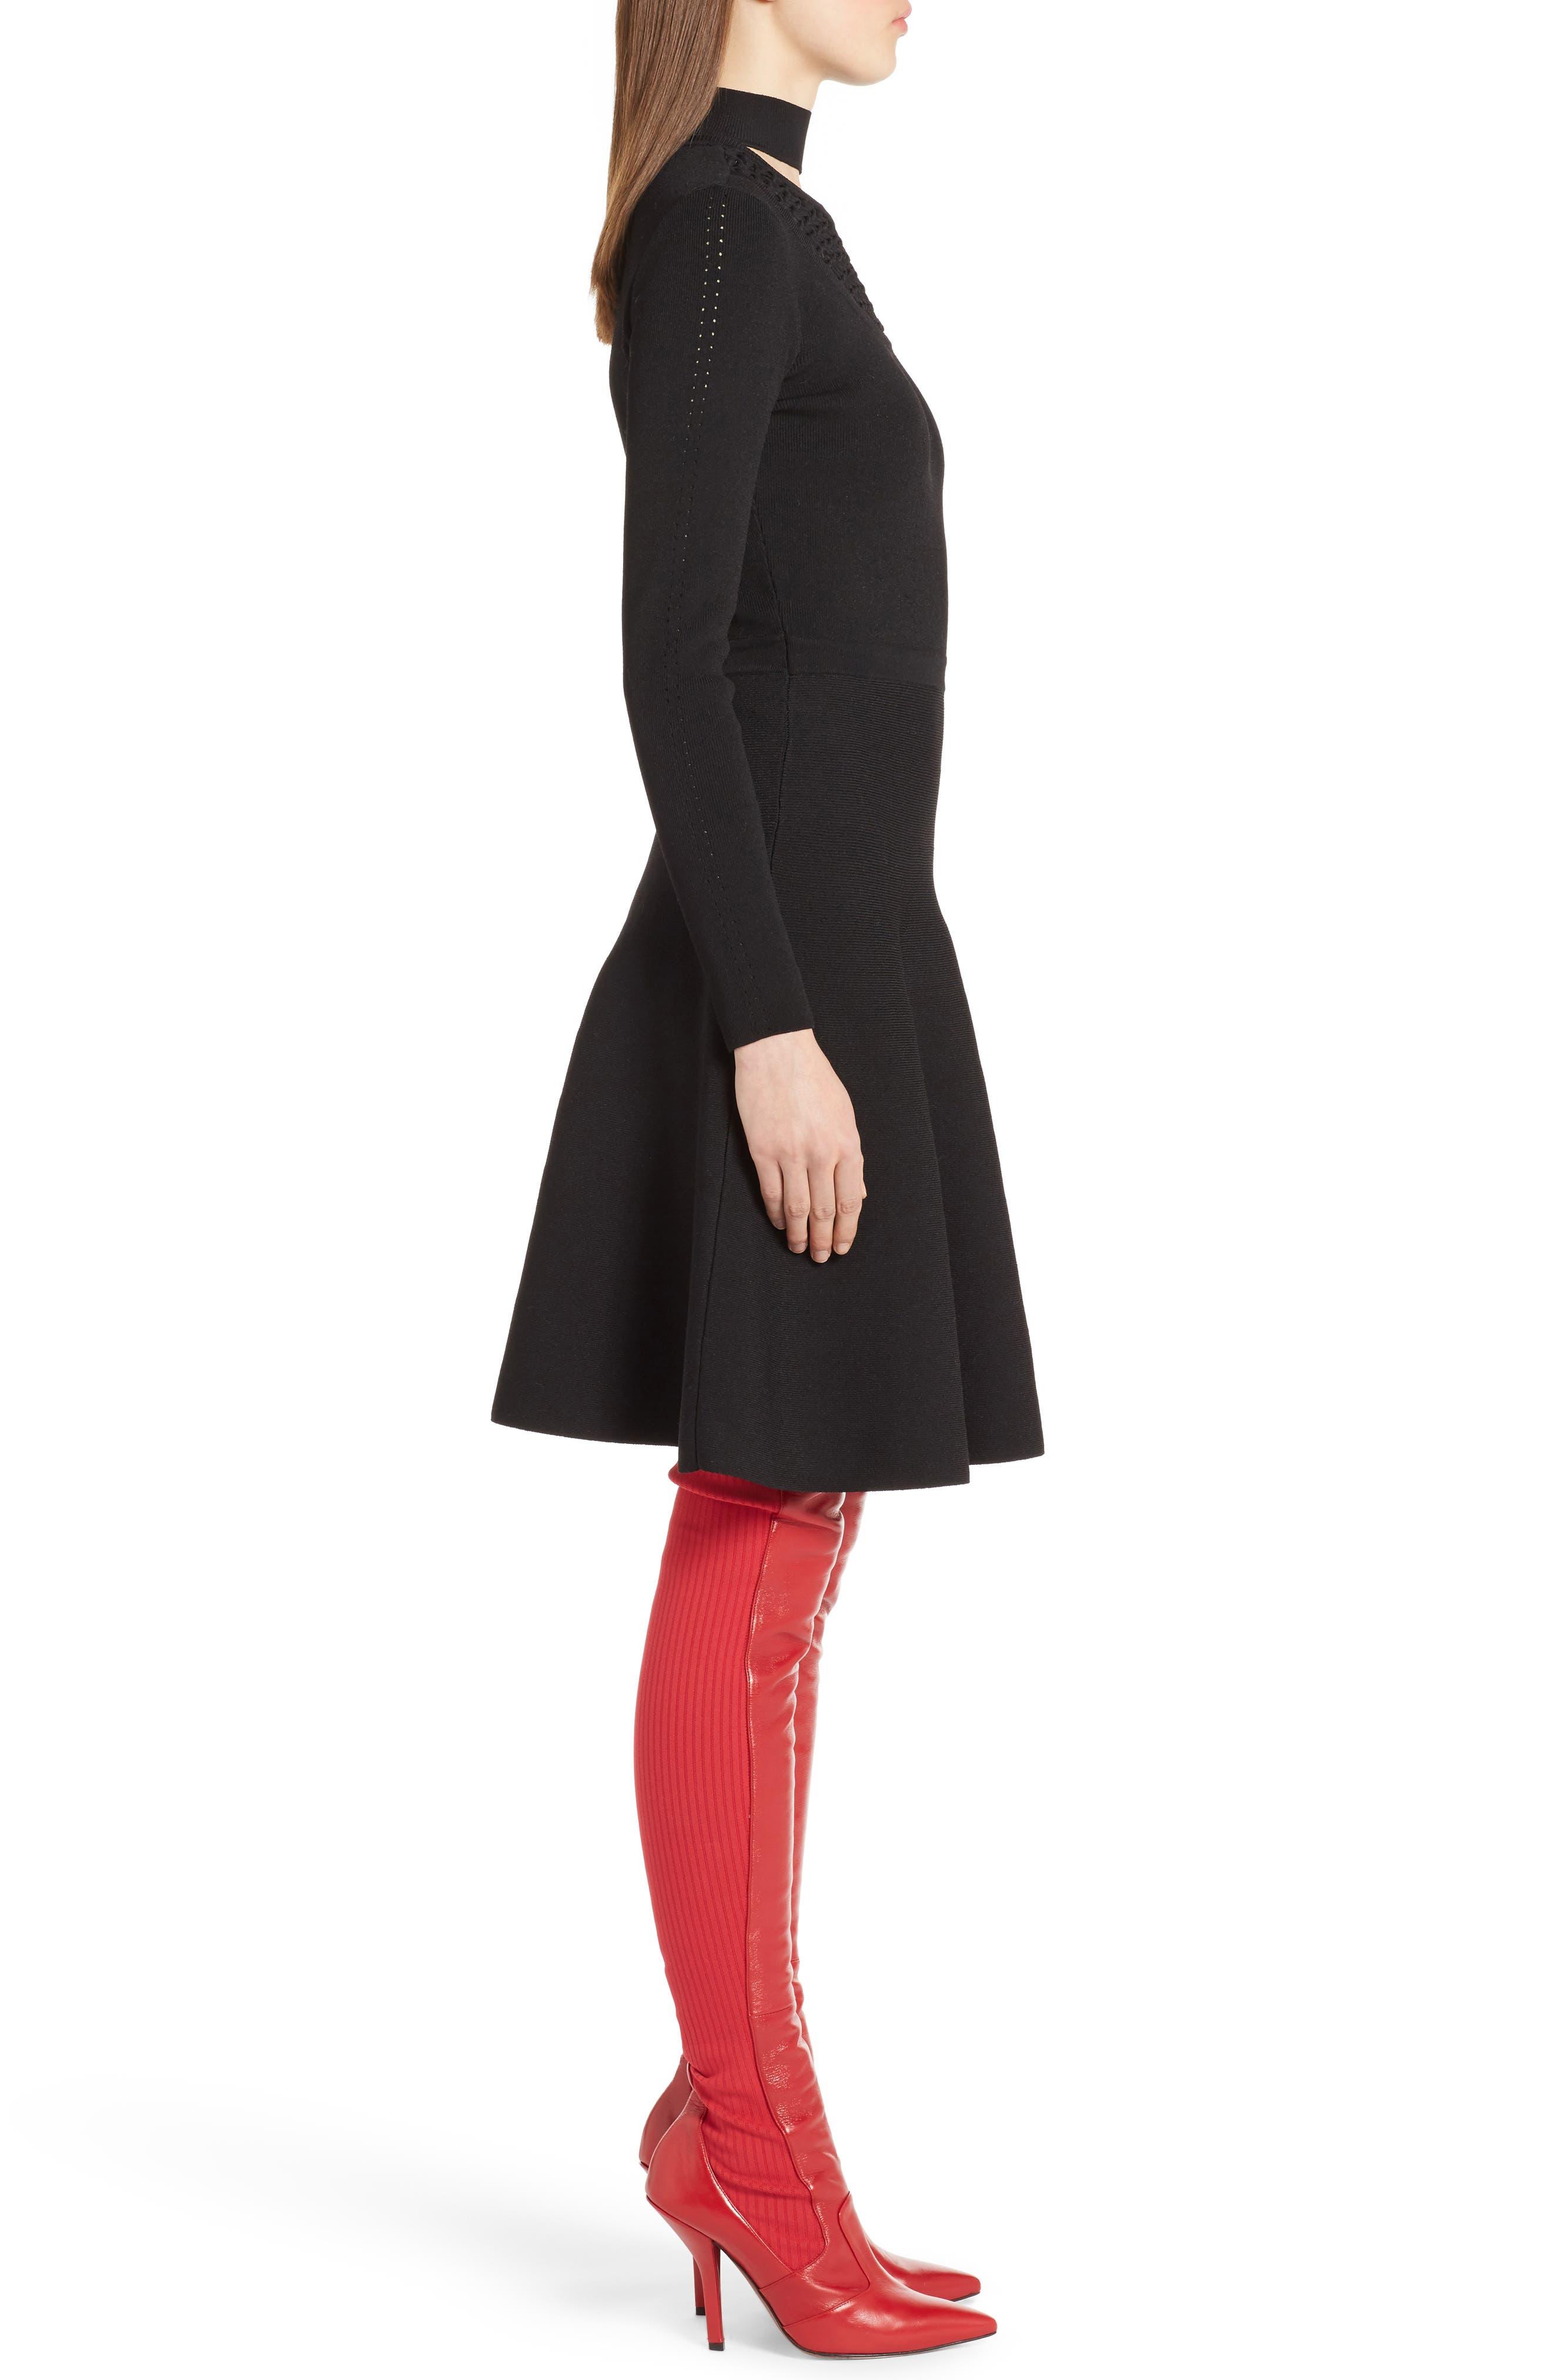 Macramé Inset Knit Dress,                             Alternate thumbnail 3, color,                             001